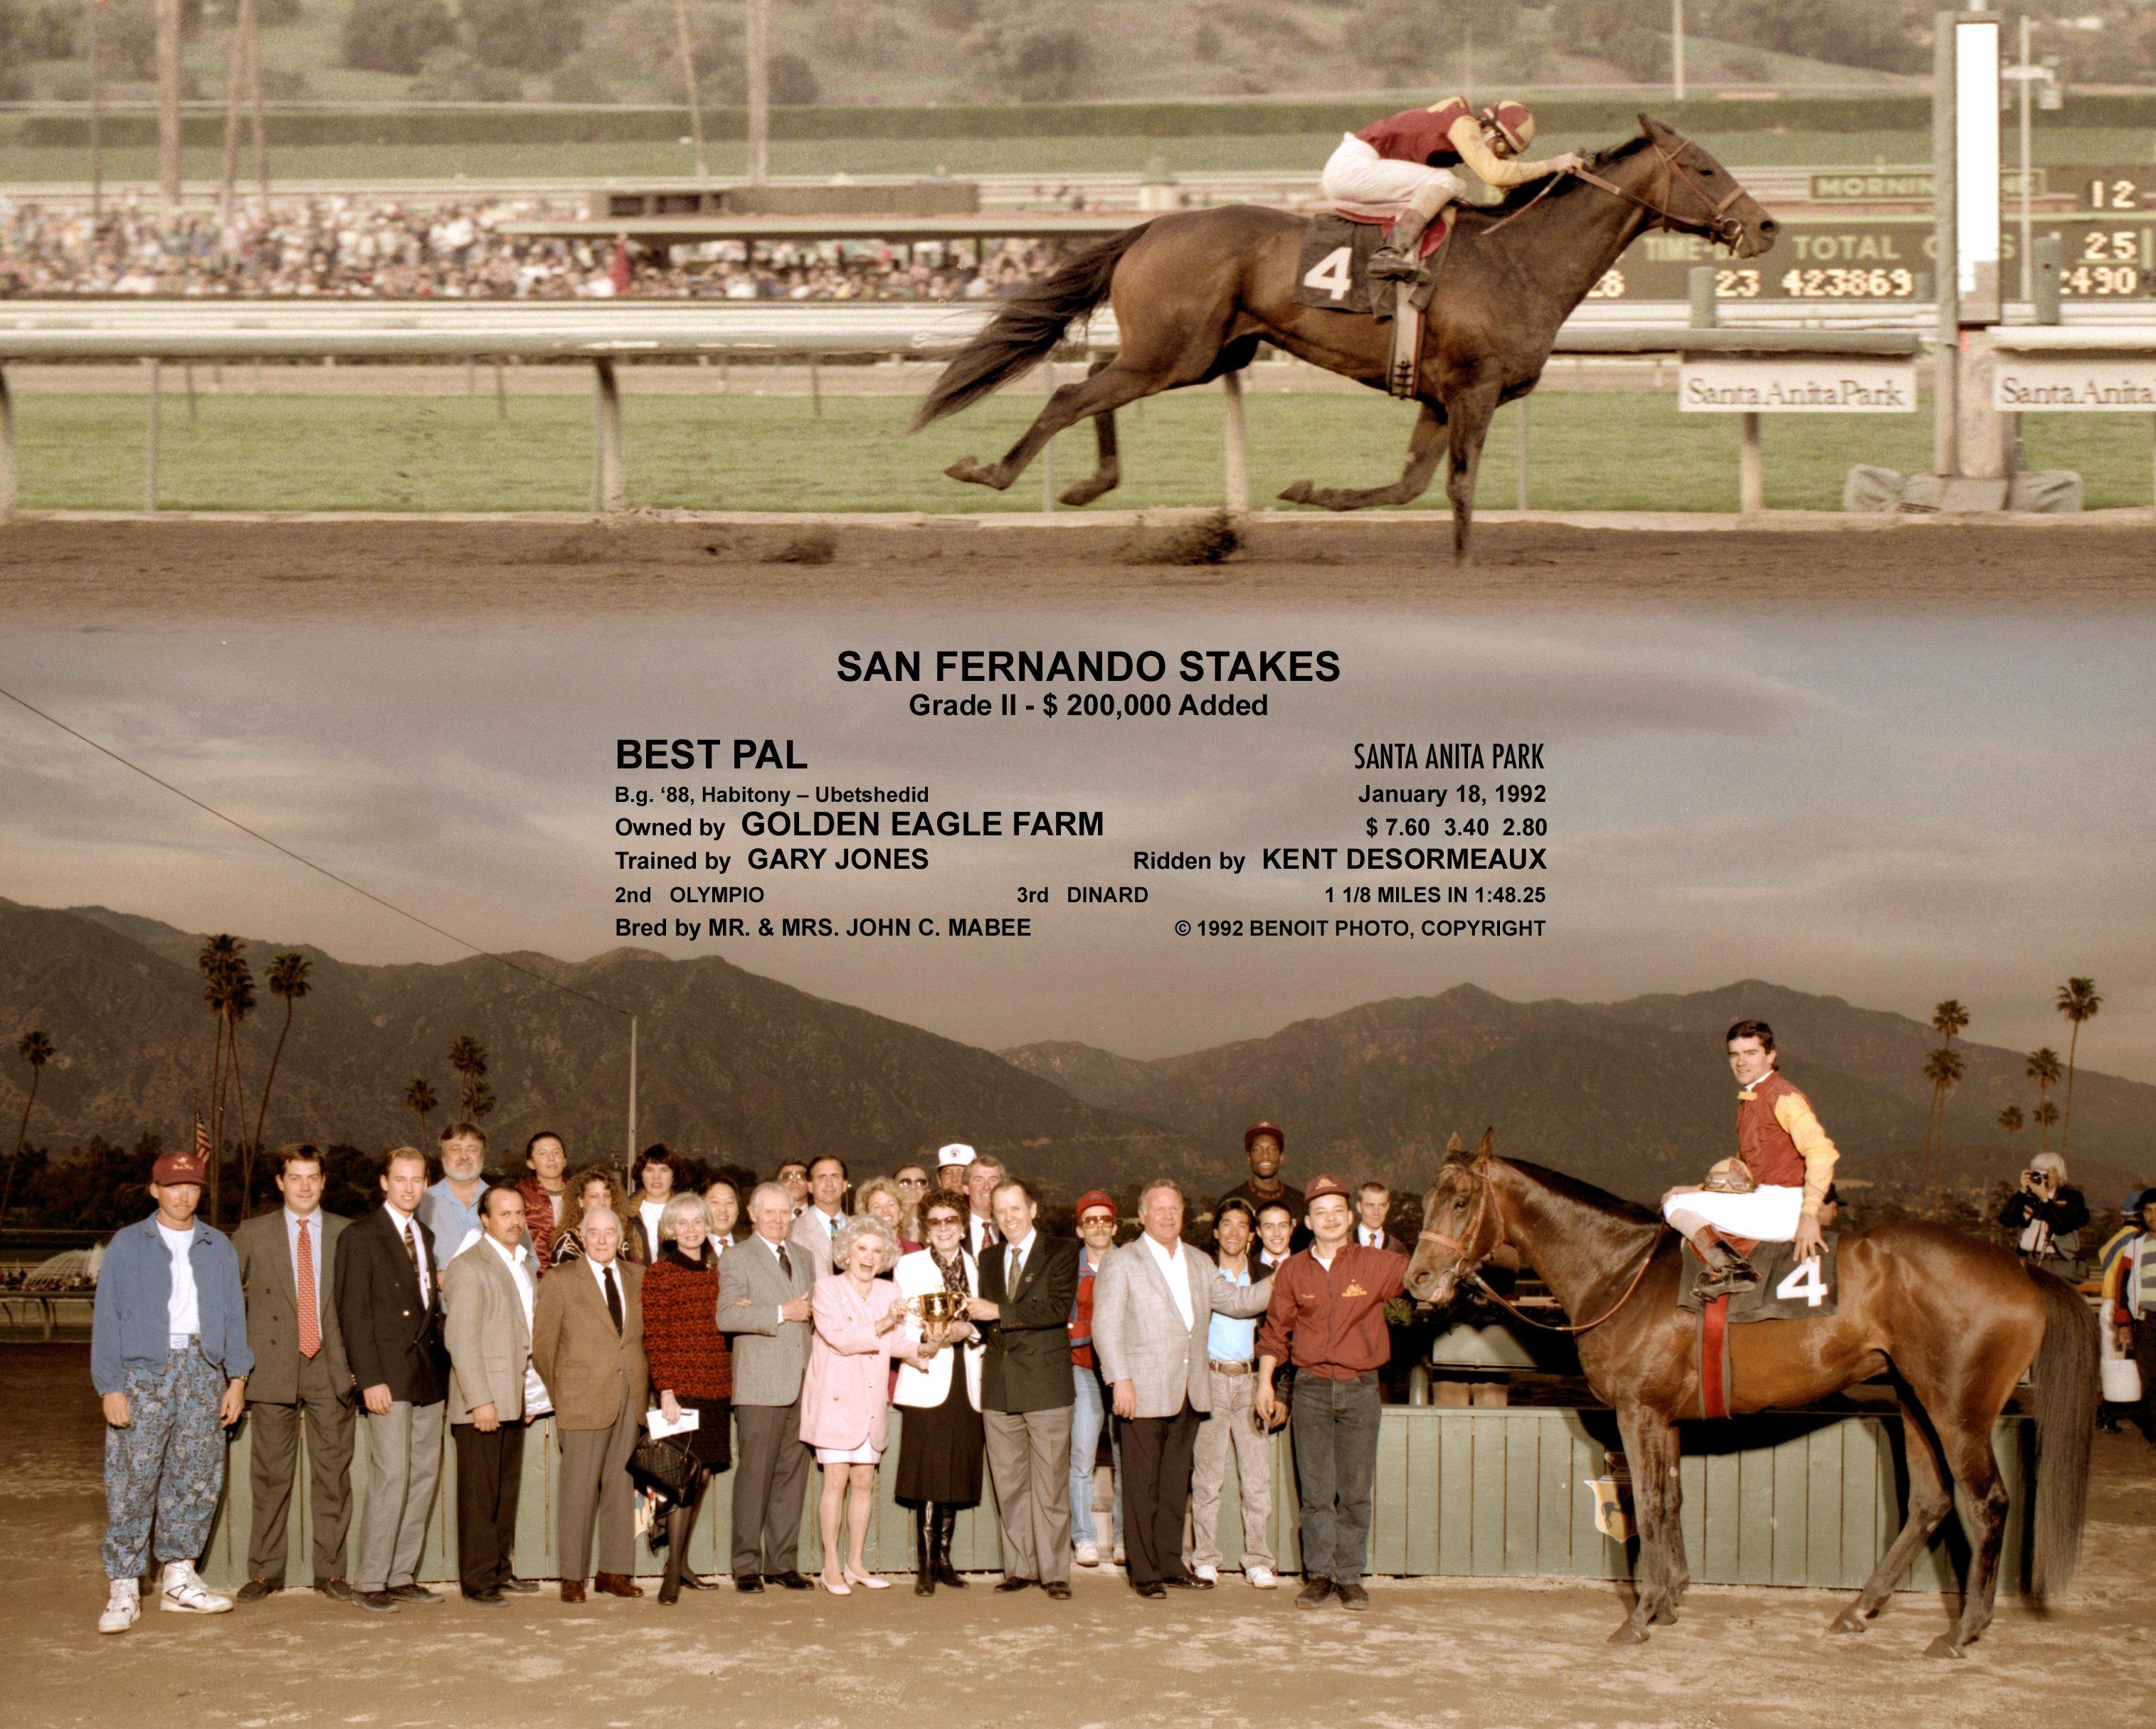 Win composite photograph for the 1992 San Fernando Stakes at Santa Anita Park, won by Best Pal (Kent Desormeaux up) (Benoit Photo)